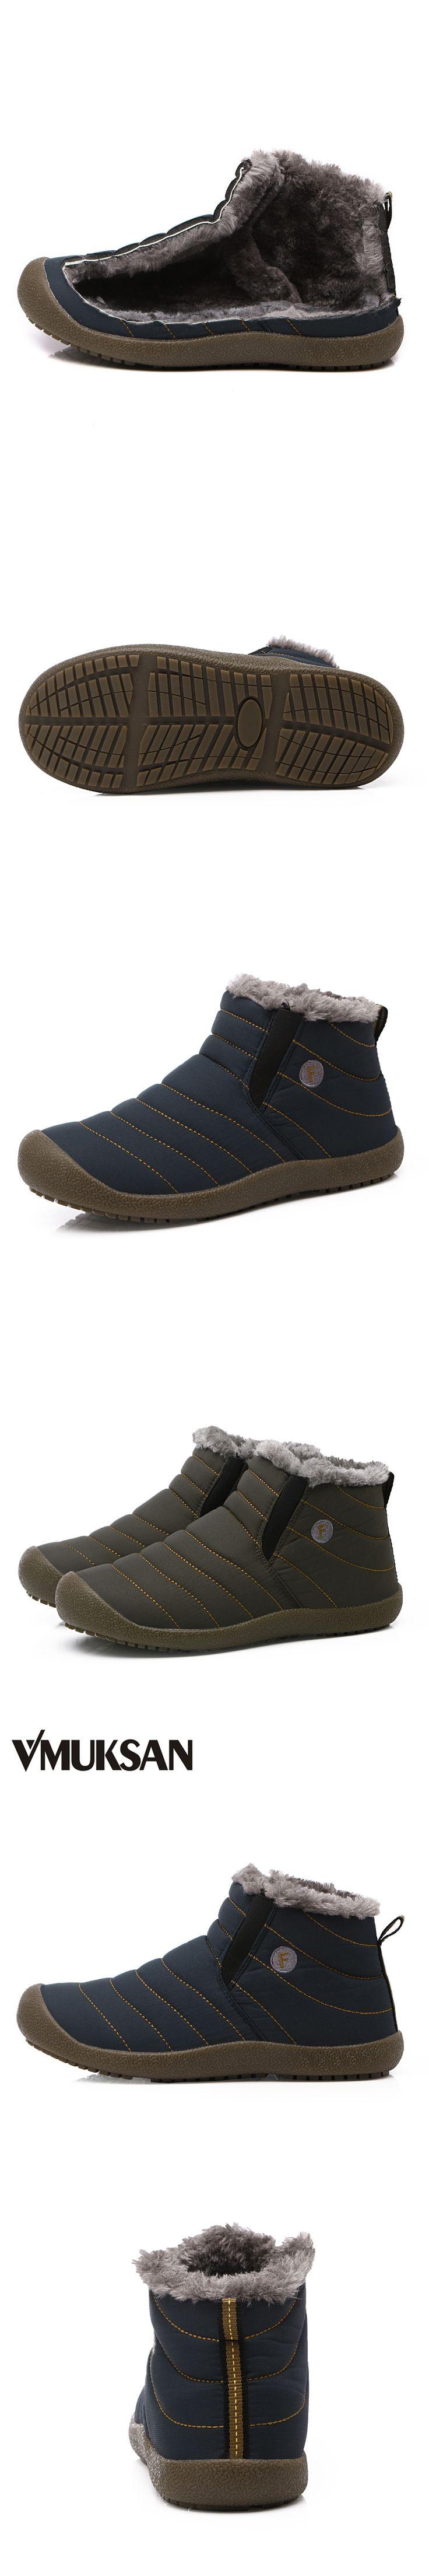 VMUKSAN Men Winter Snow Shoes Man Boot Lightweight Ankle Boots Warm Waterproof Mens Rain Boots 2017 New Furry Men Boots